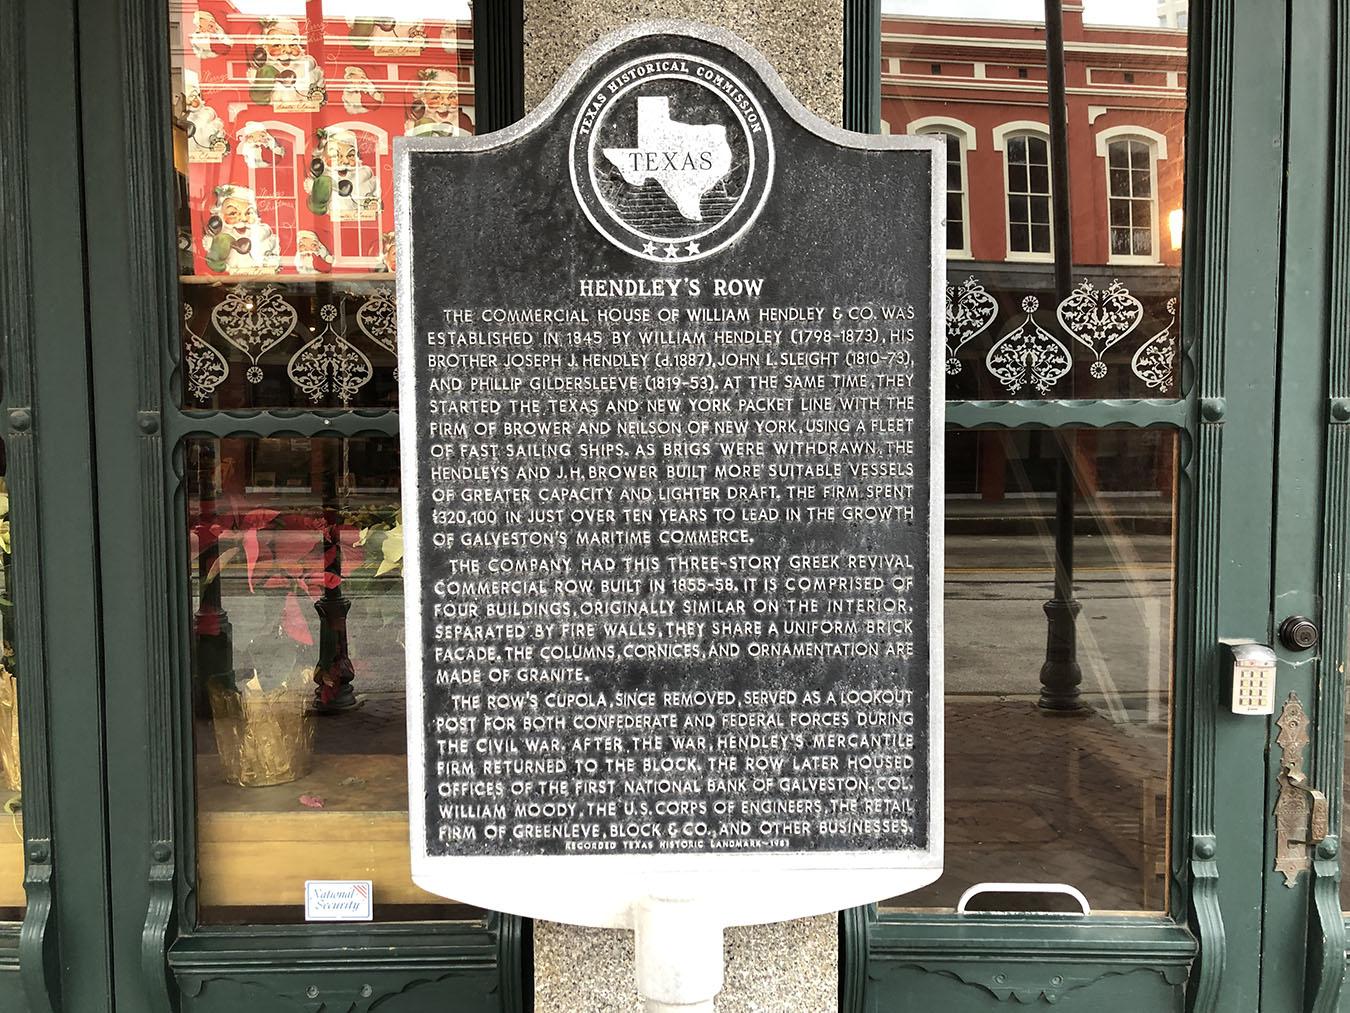 Hendley's Row Historical Marker